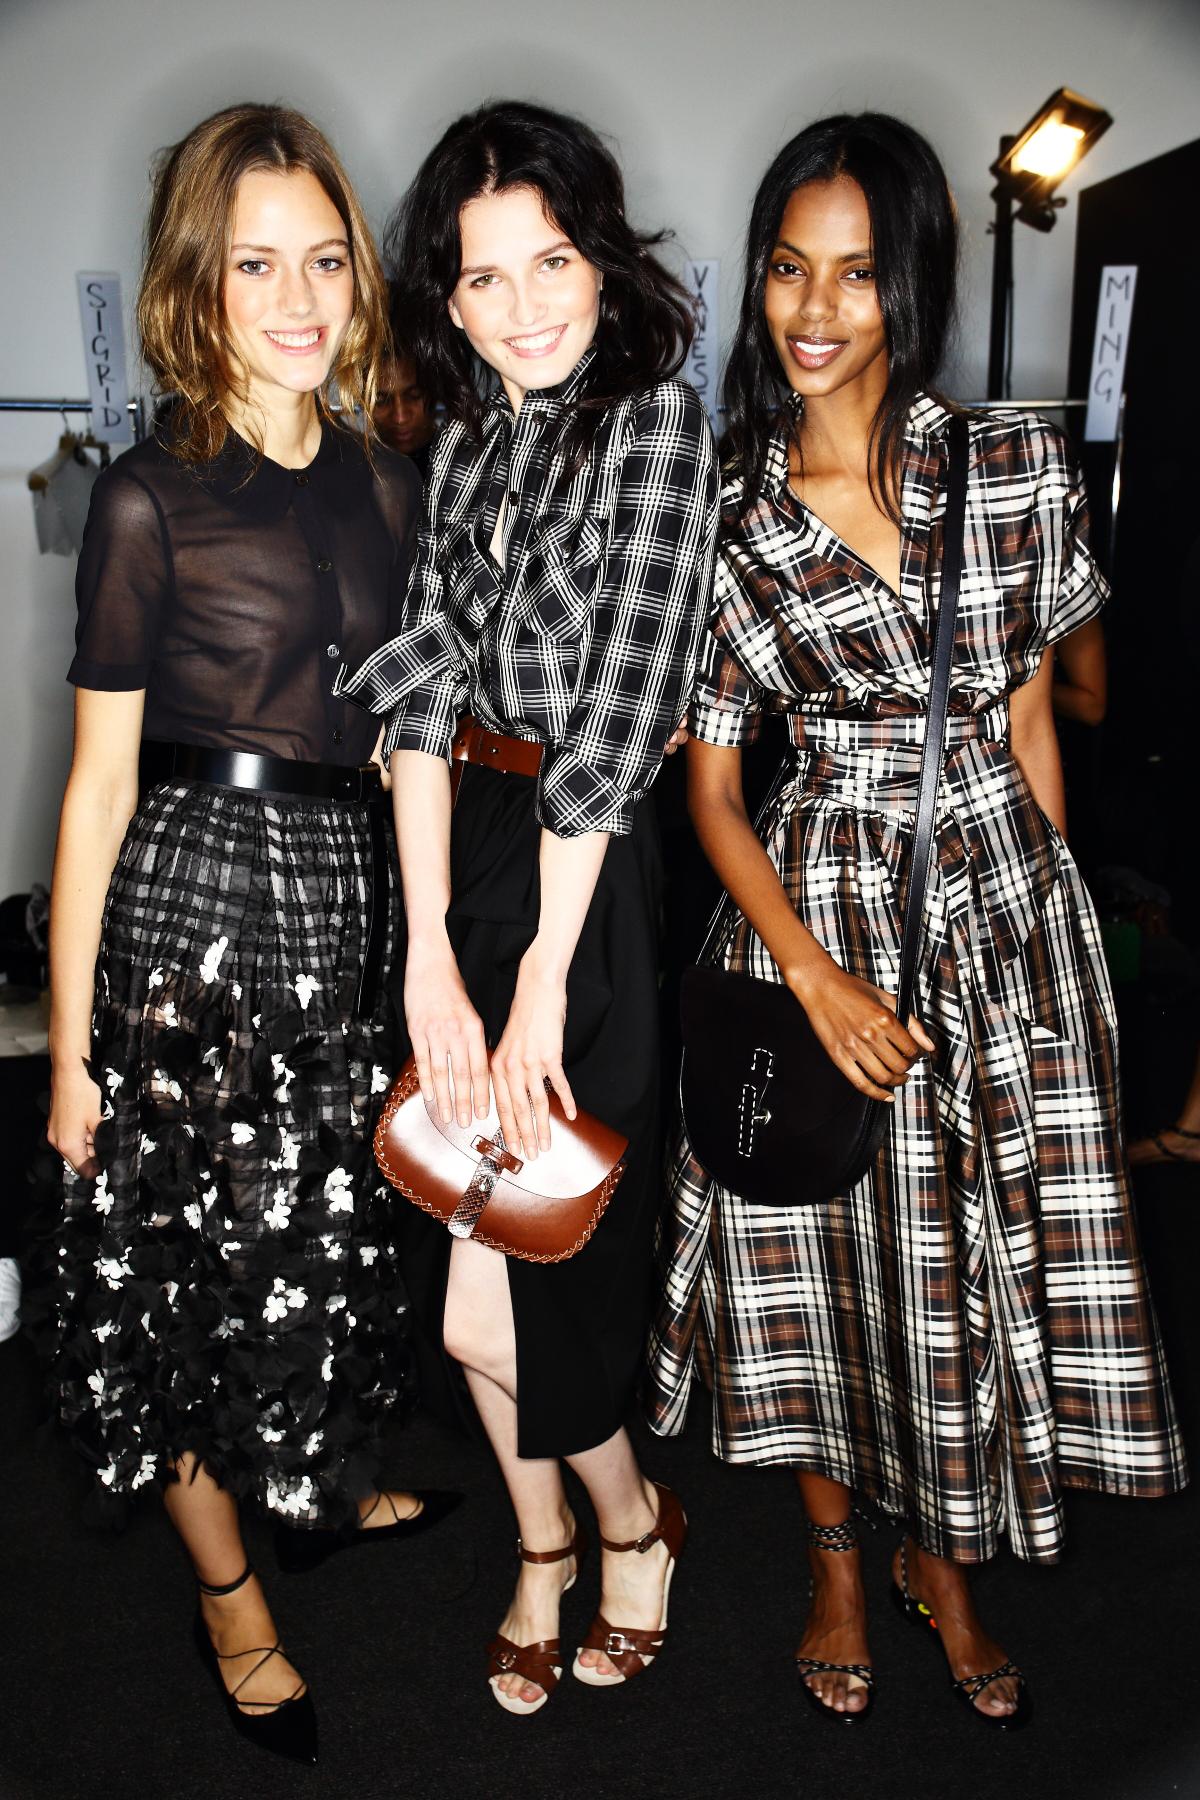 Michael Kors SS15 Fashion Show New York Backstage